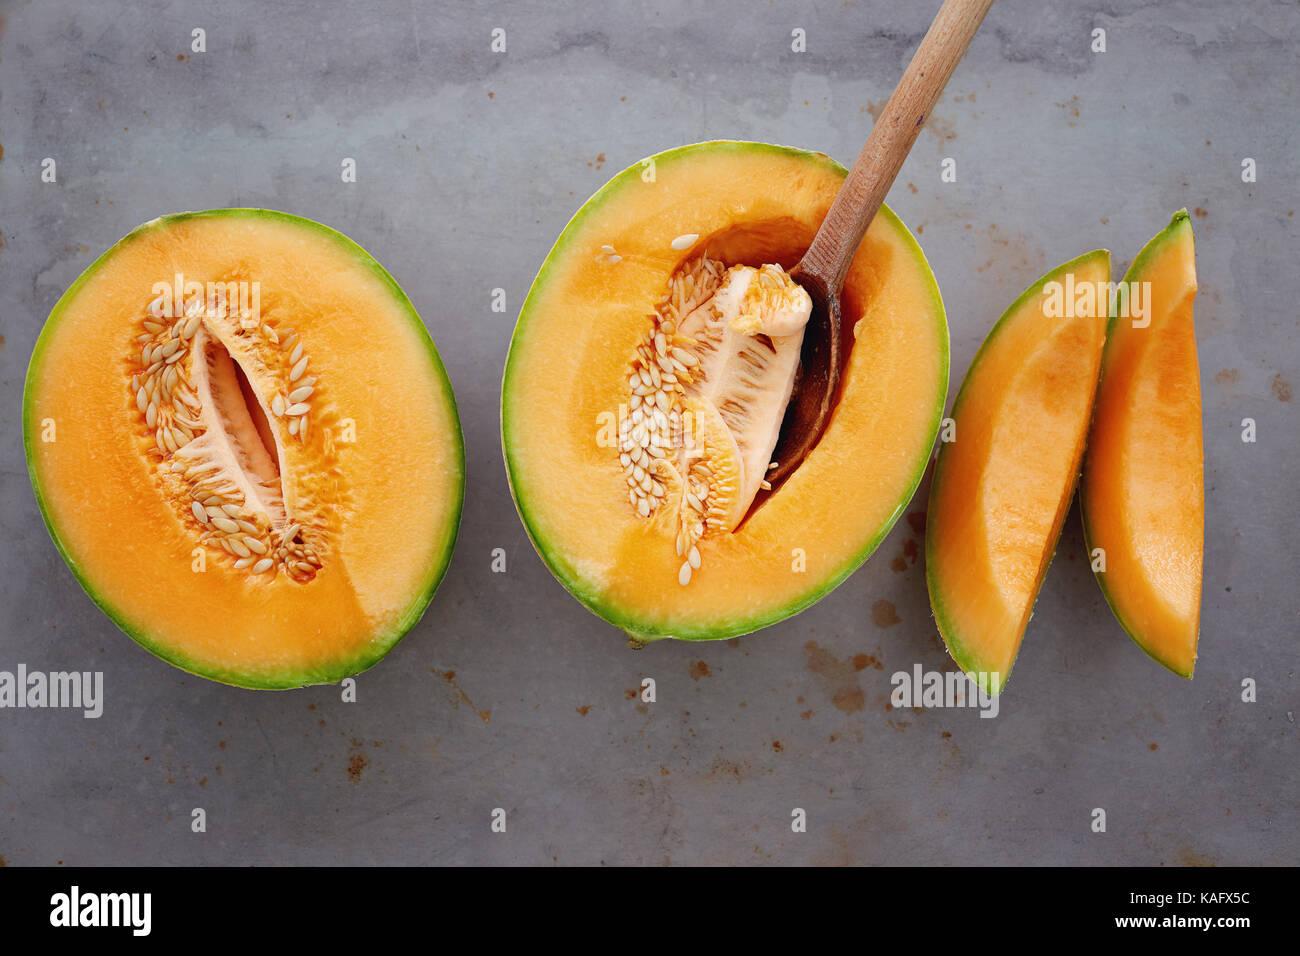 Fresh cantaloupe cut into pieces. Half cut of ripe cantaloupe melon with spoon. Stock Photo